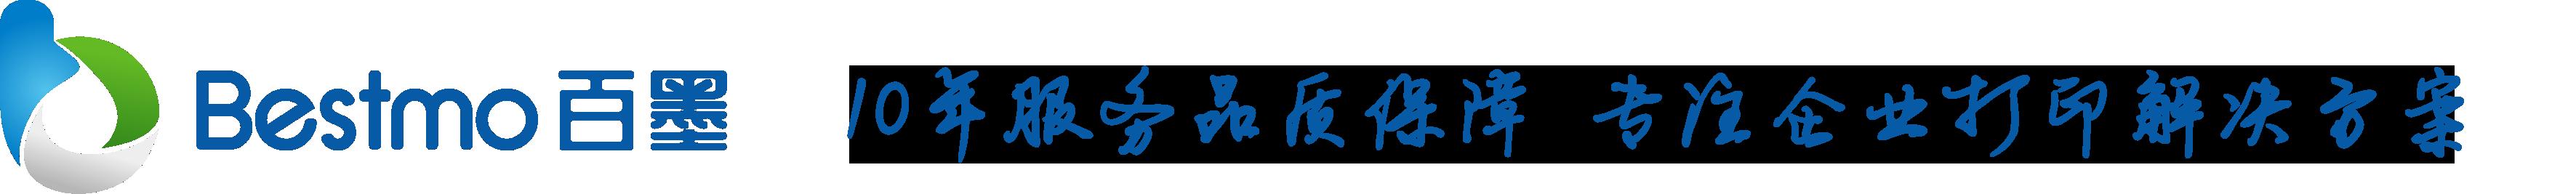 logo定稿3